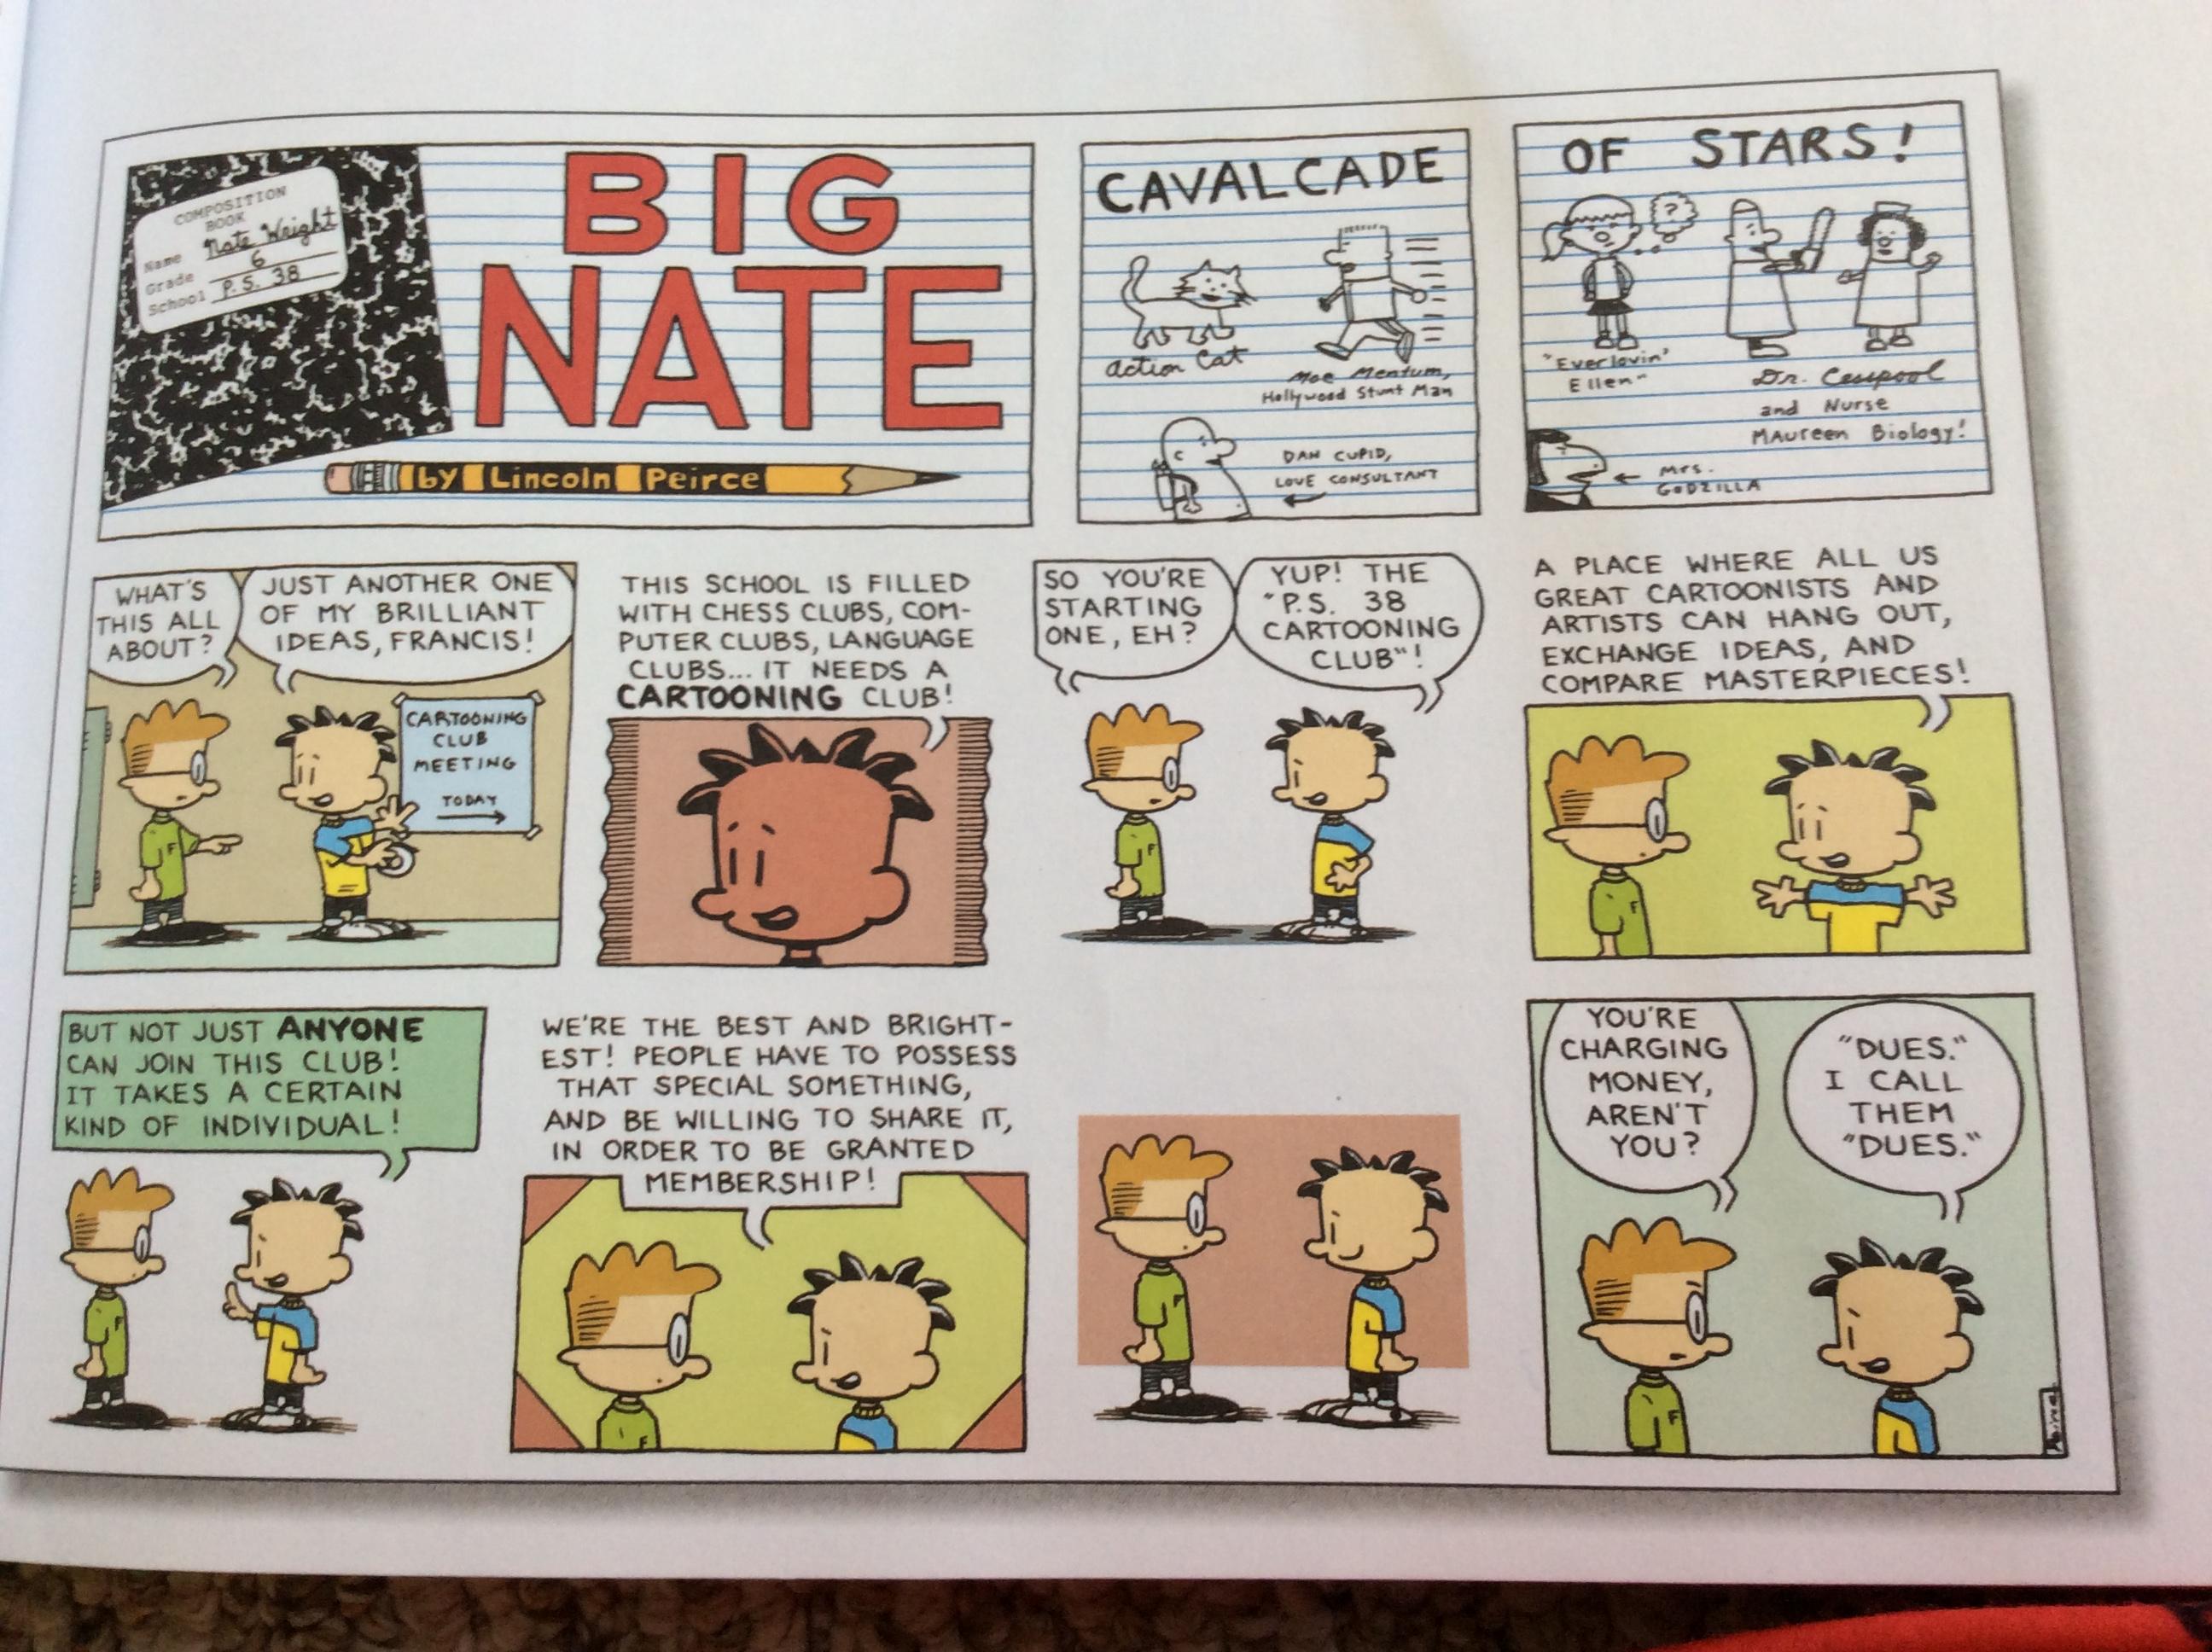 Comic Strip: October 17, 1993